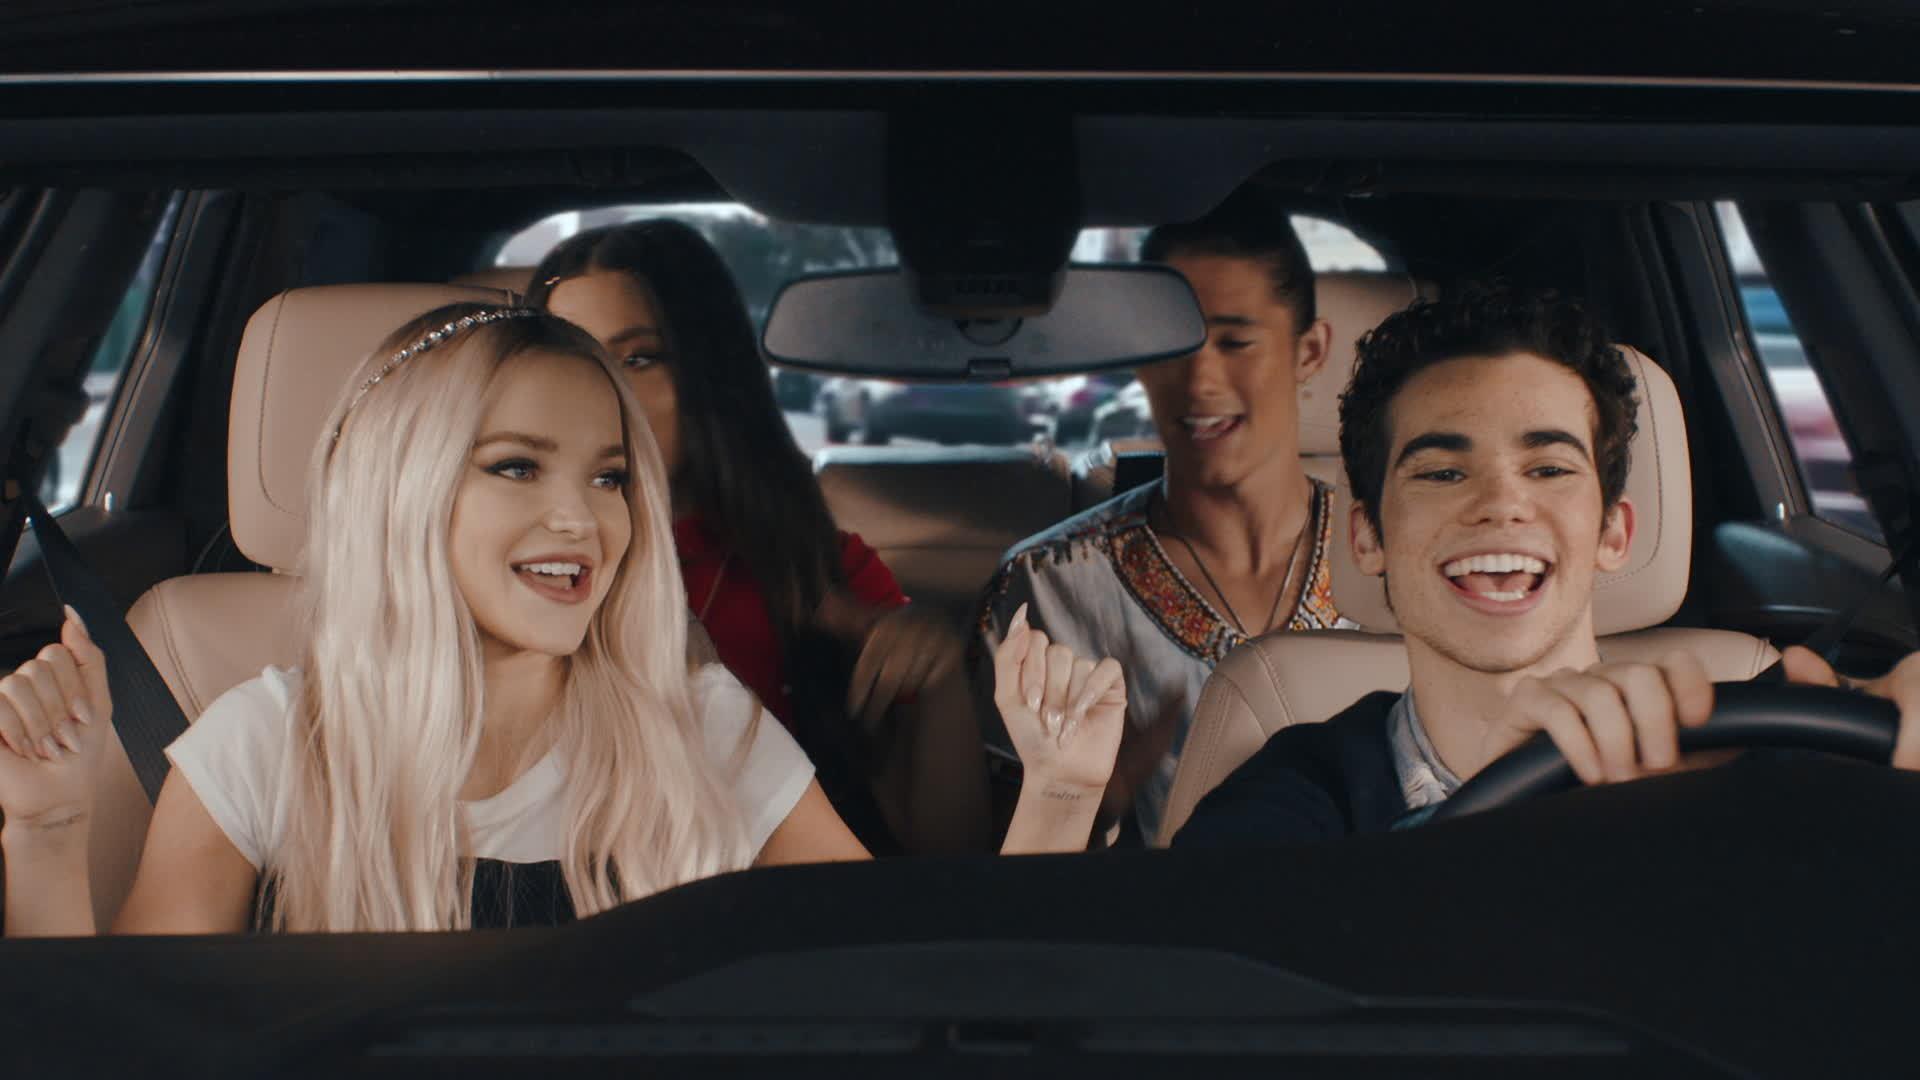 Disney Carscendants: Good To Be Bad Music Video